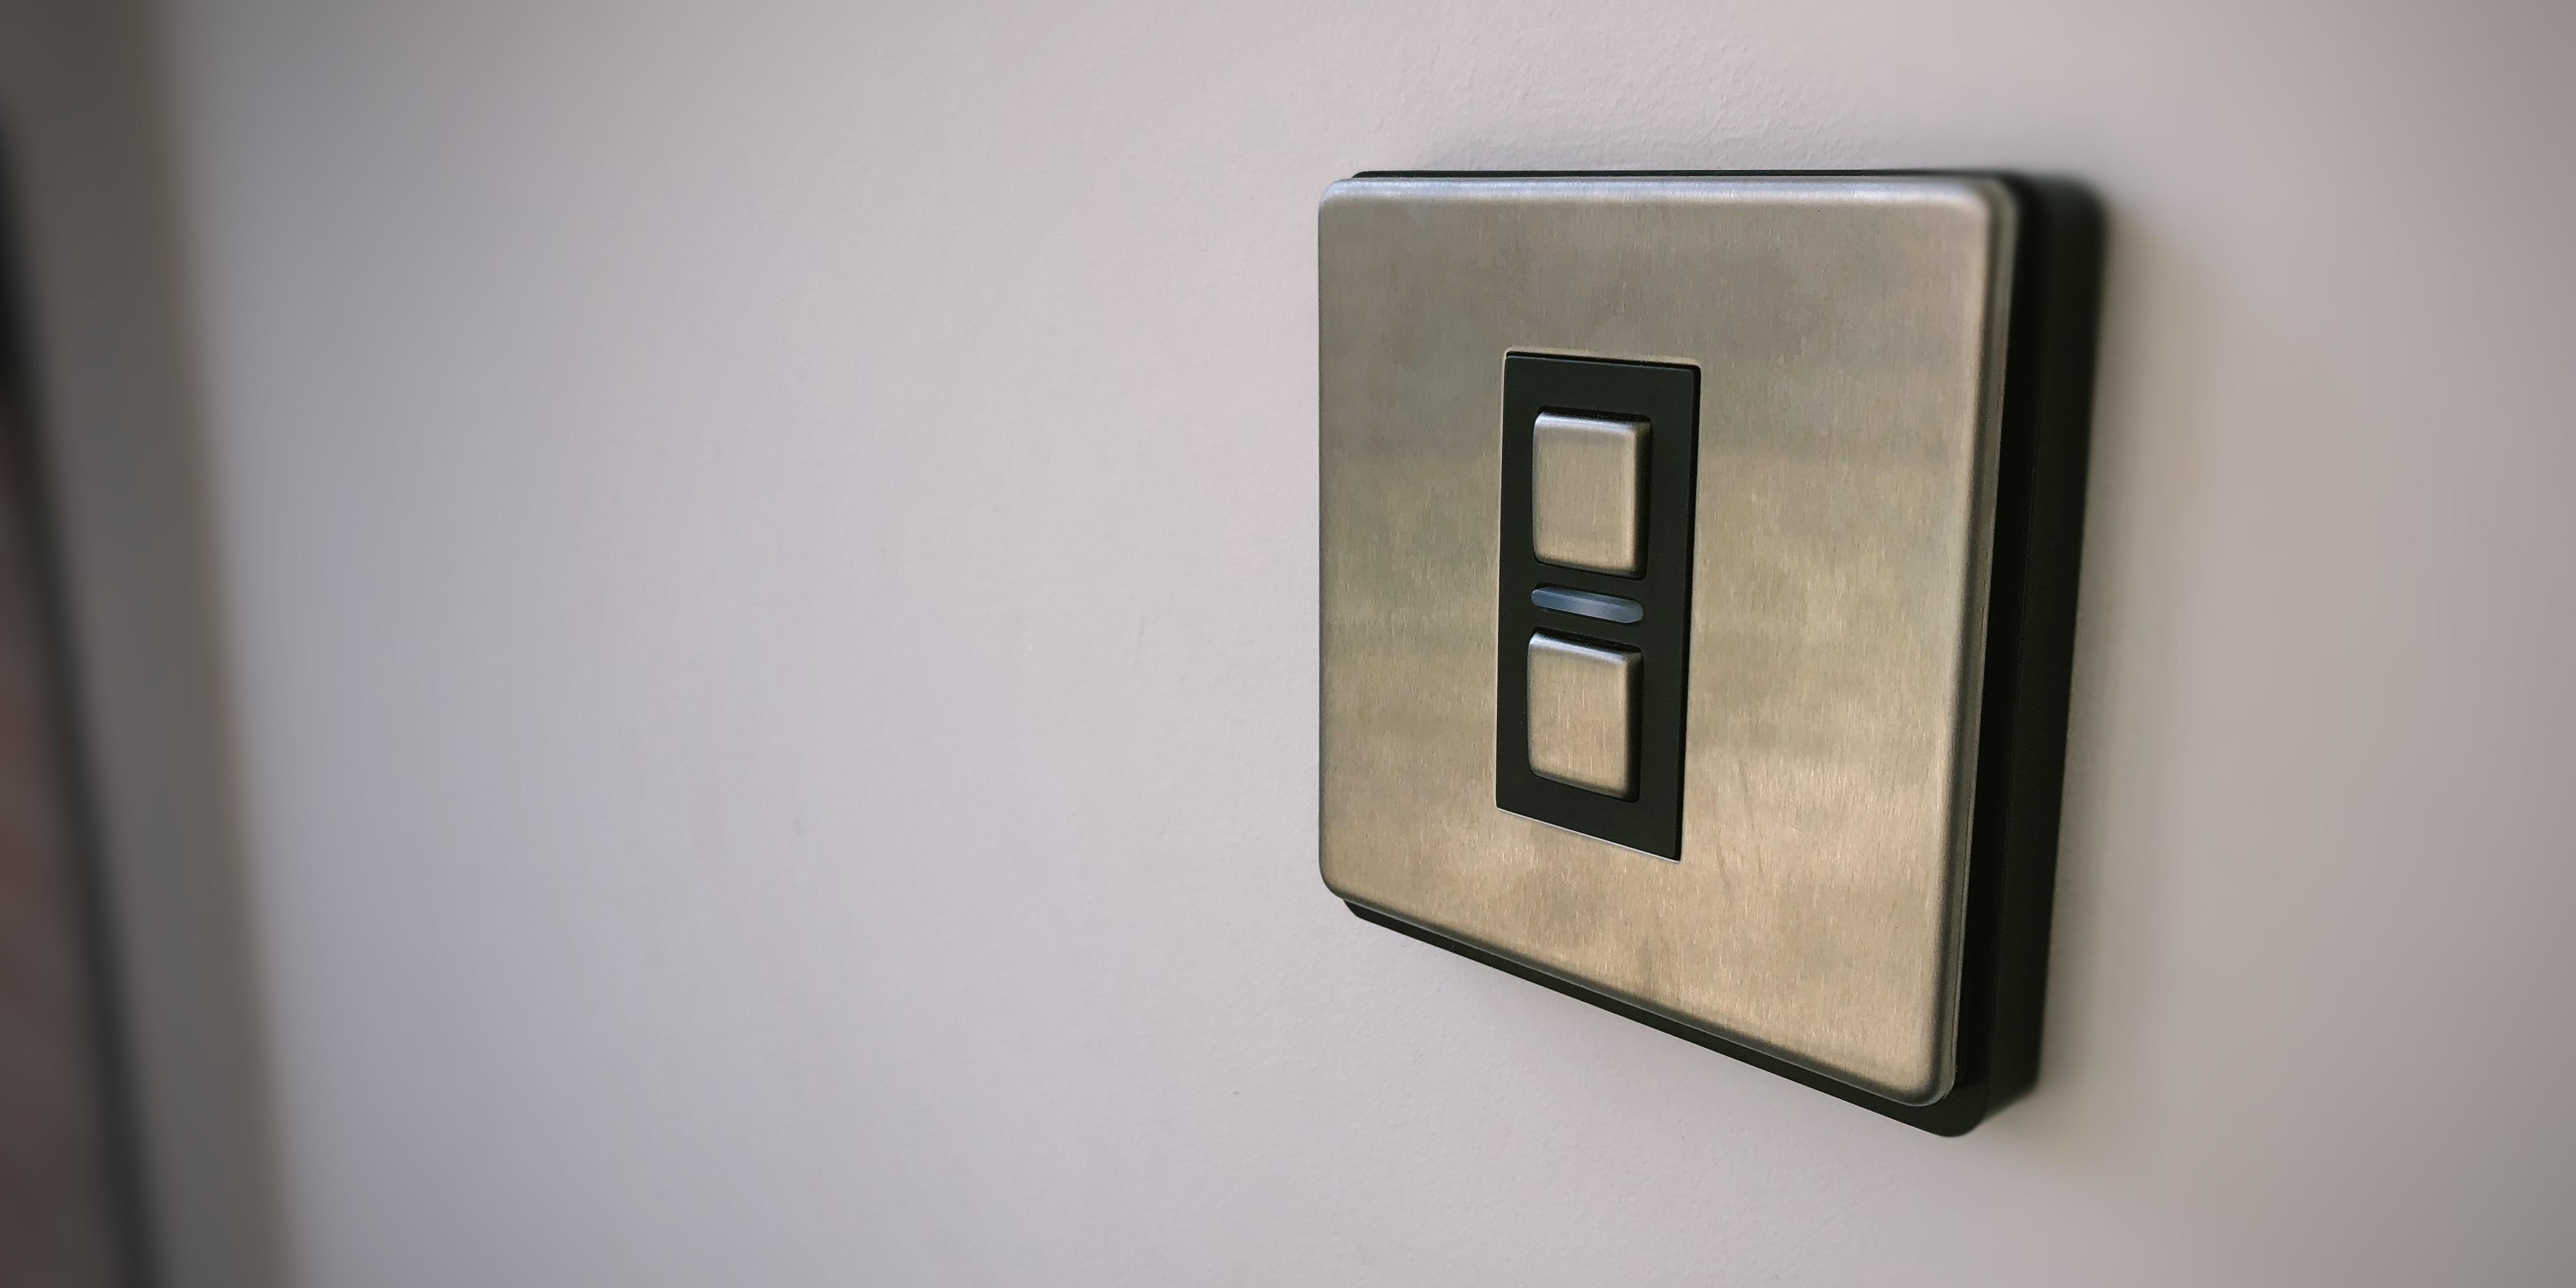 review lightwave light switch, the best uk homekit solution for